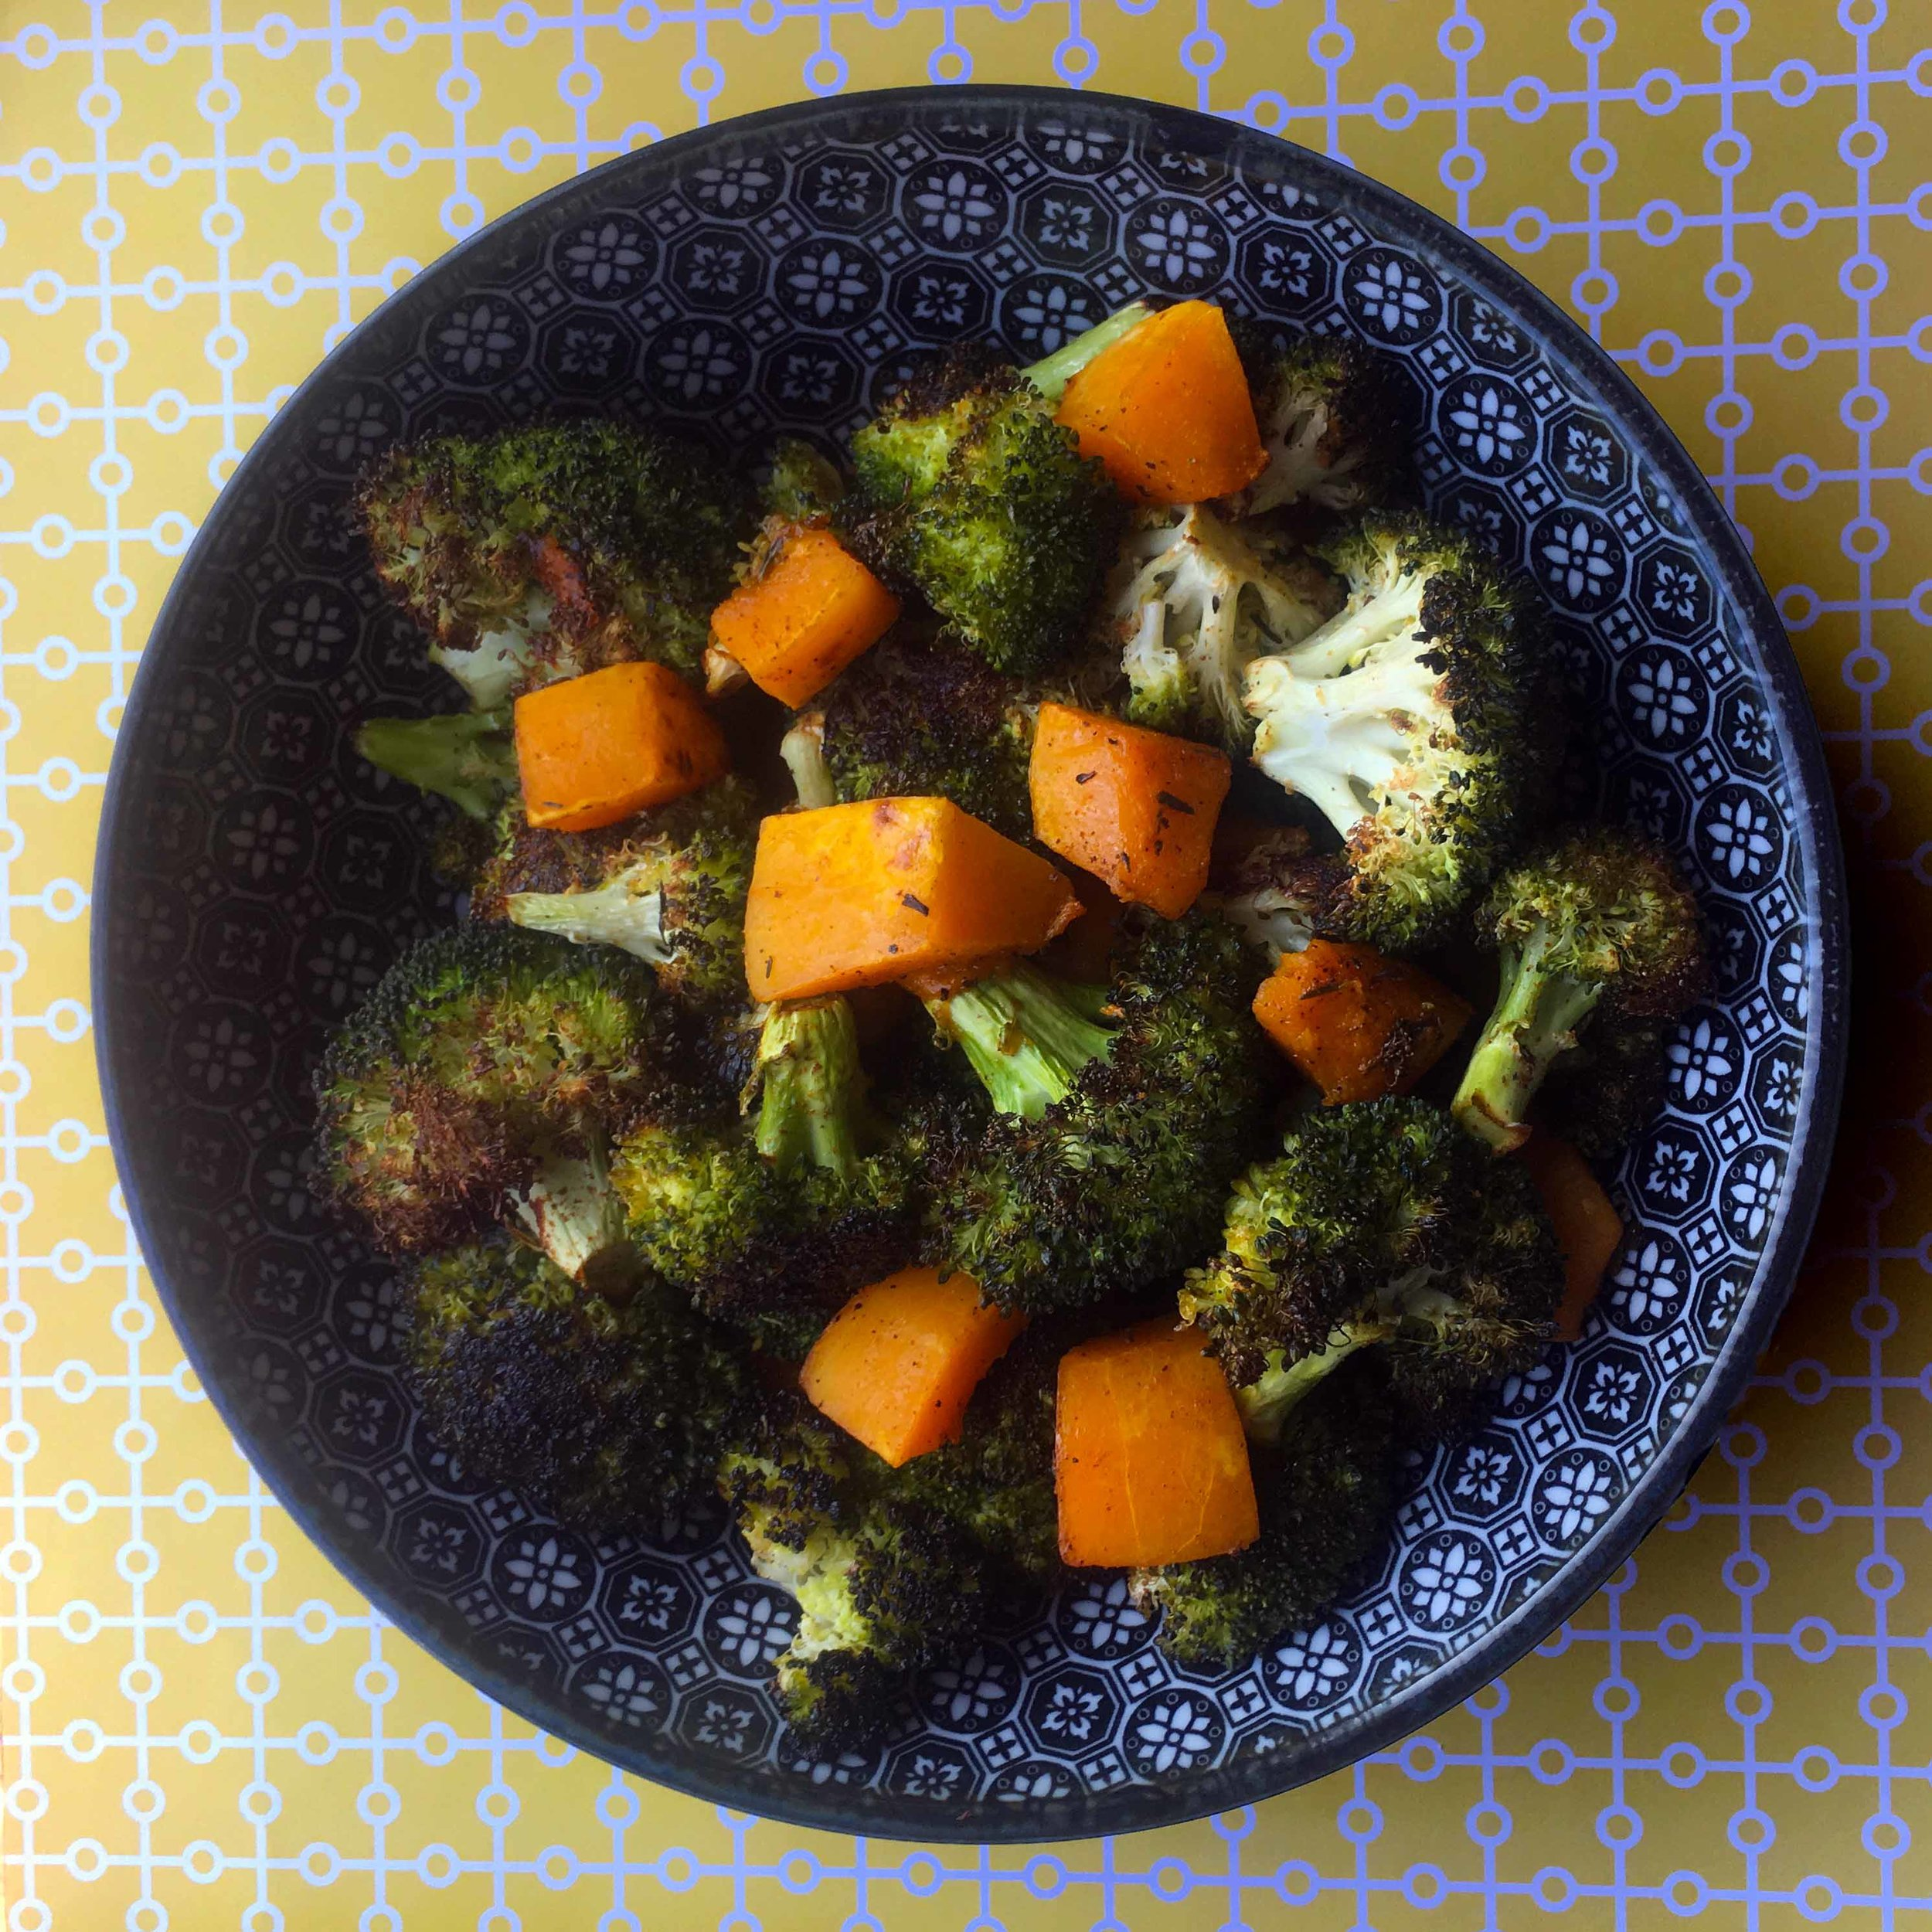 Roasted Broccoli and Butternut Squash Recipe